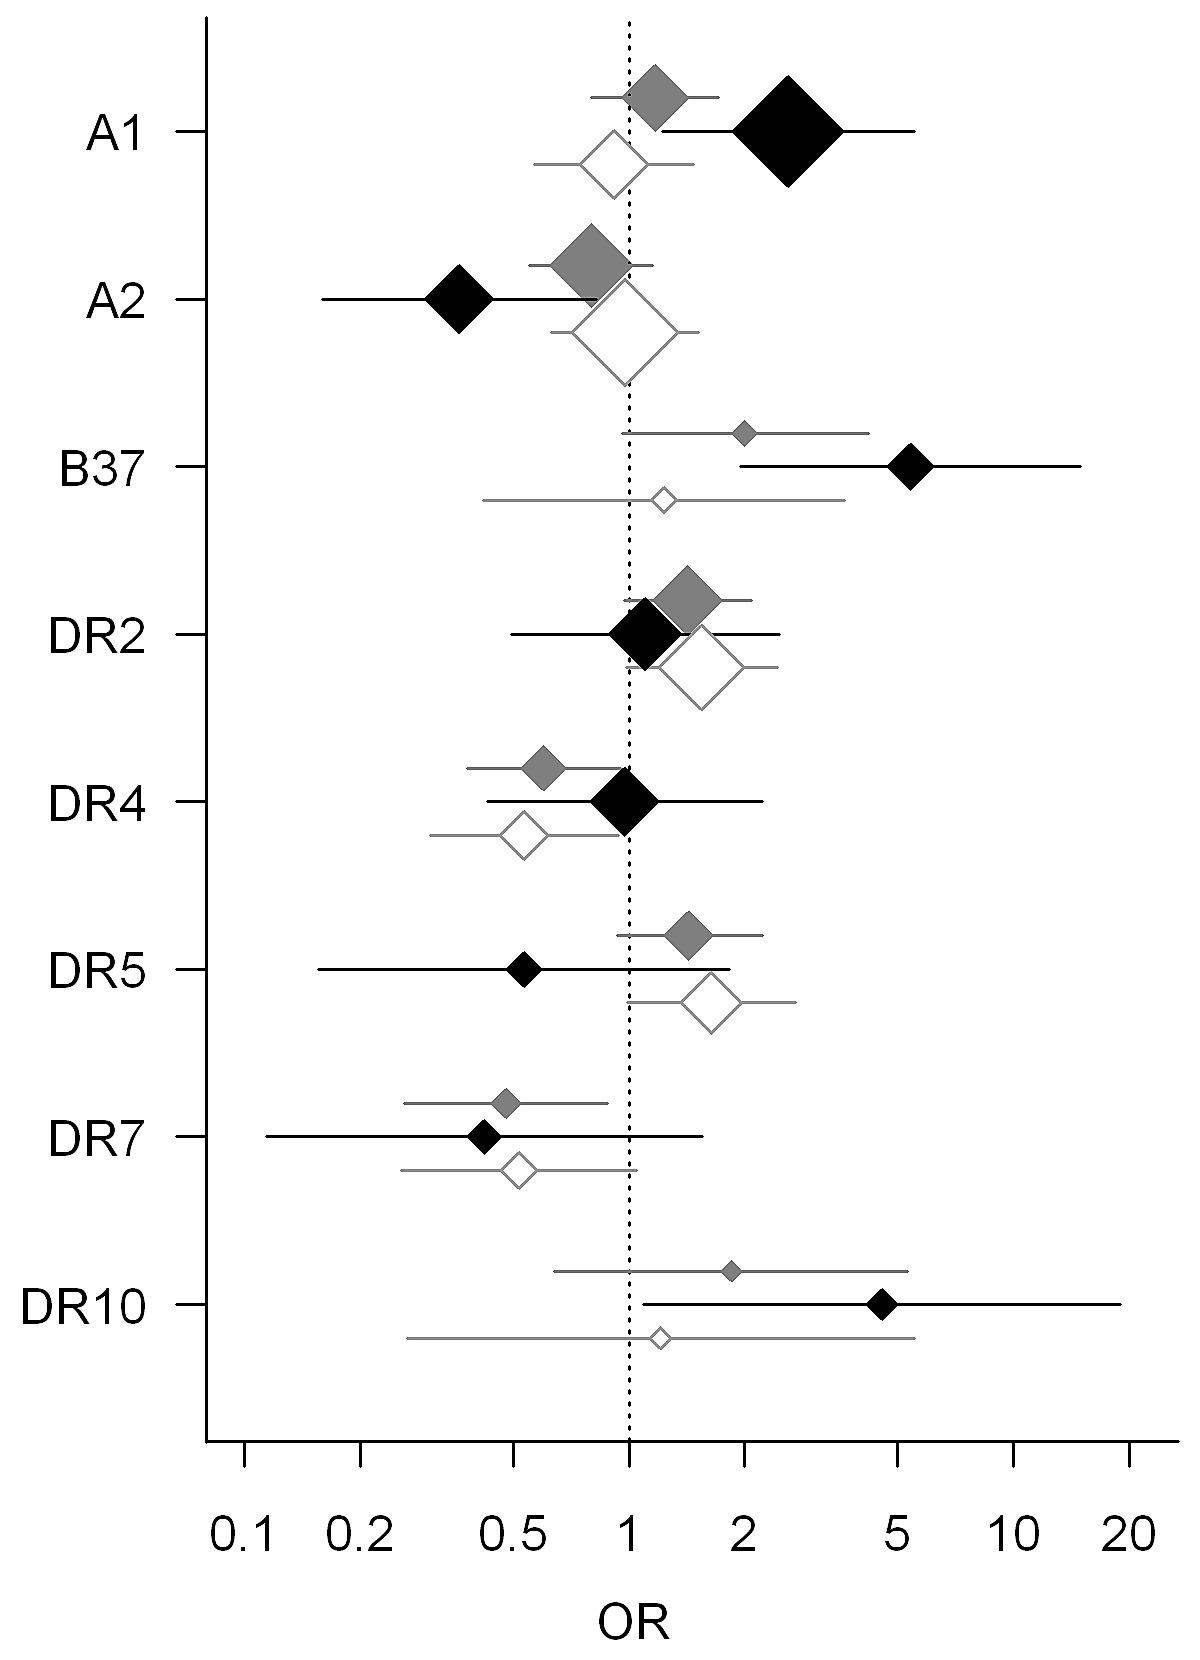 HLA Associations in Classical Hodgkin Lymphoma: EBV Status Matters